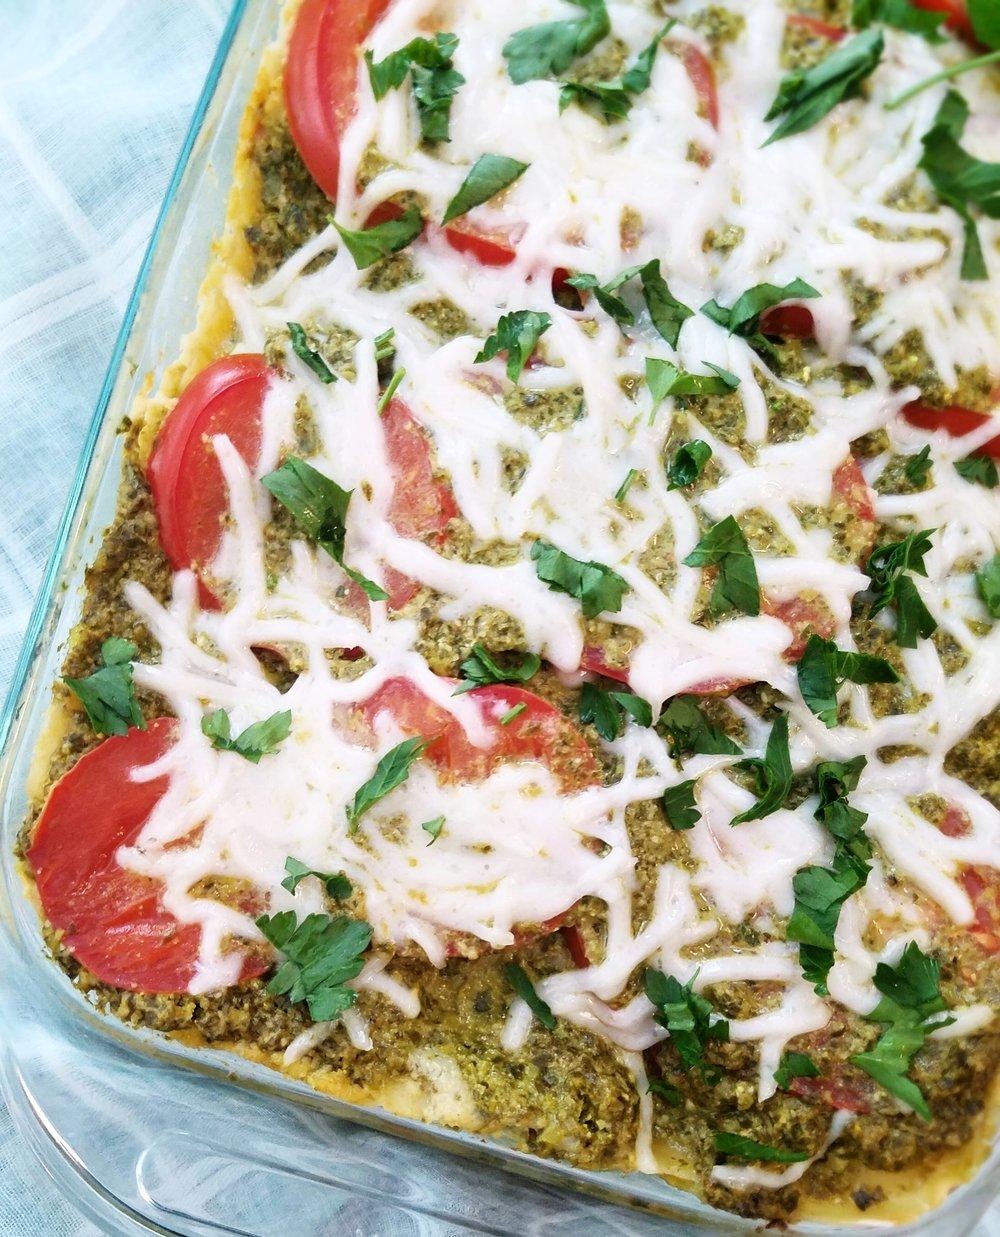 Zesty Pesto and Artichoke Ricotta Lasagna